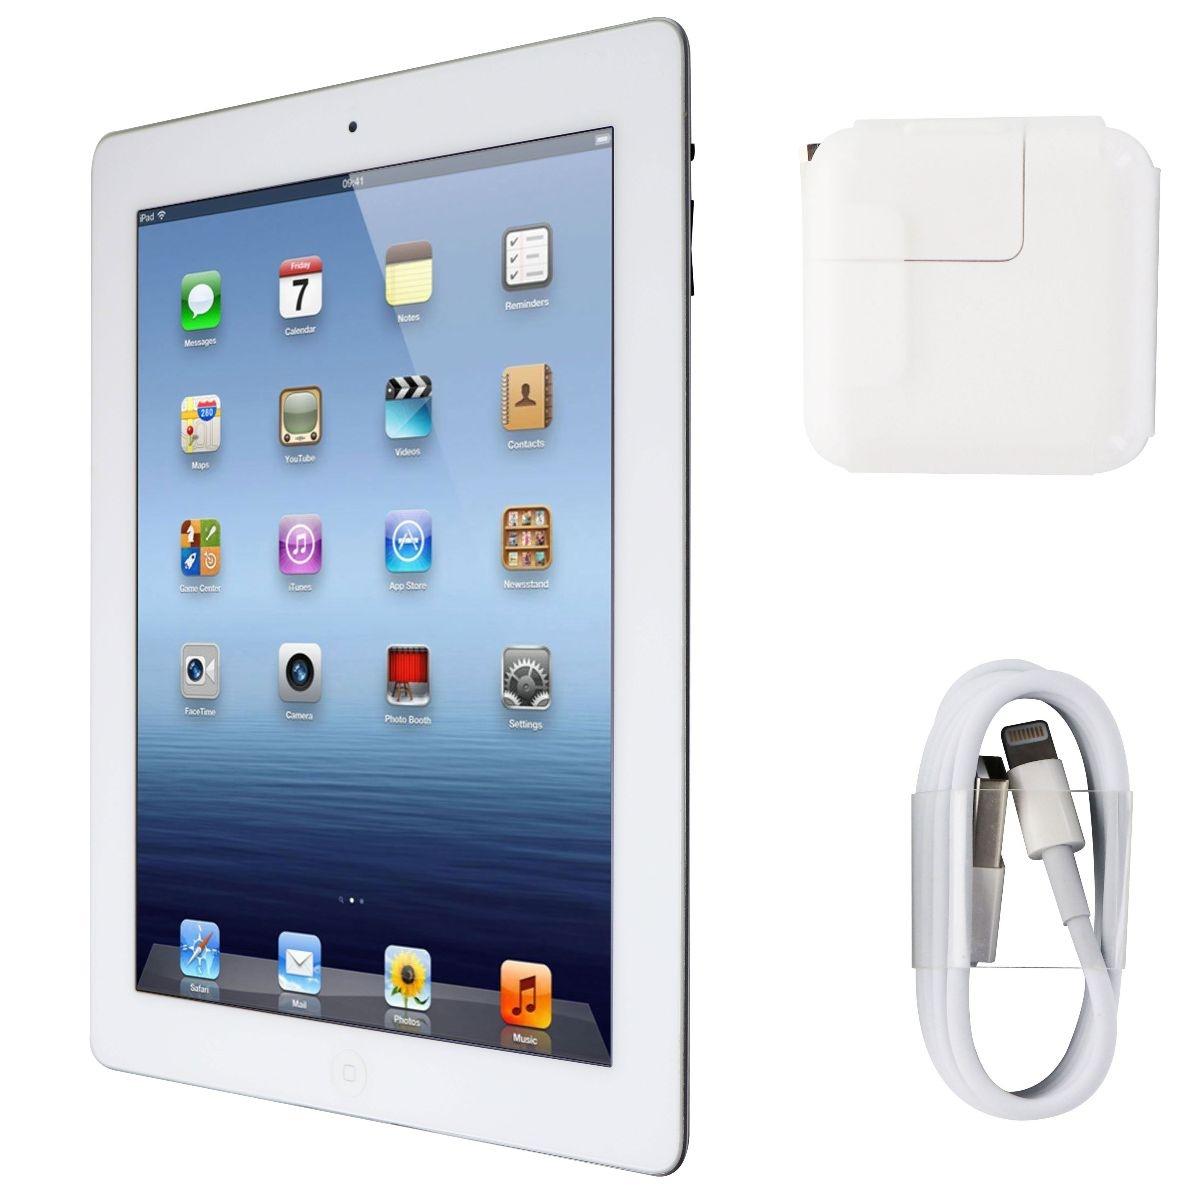 Apple iPad 9.7 (4th Gen) Tablet A1460 (Wi-Fi + Verizon) - 16GB / White